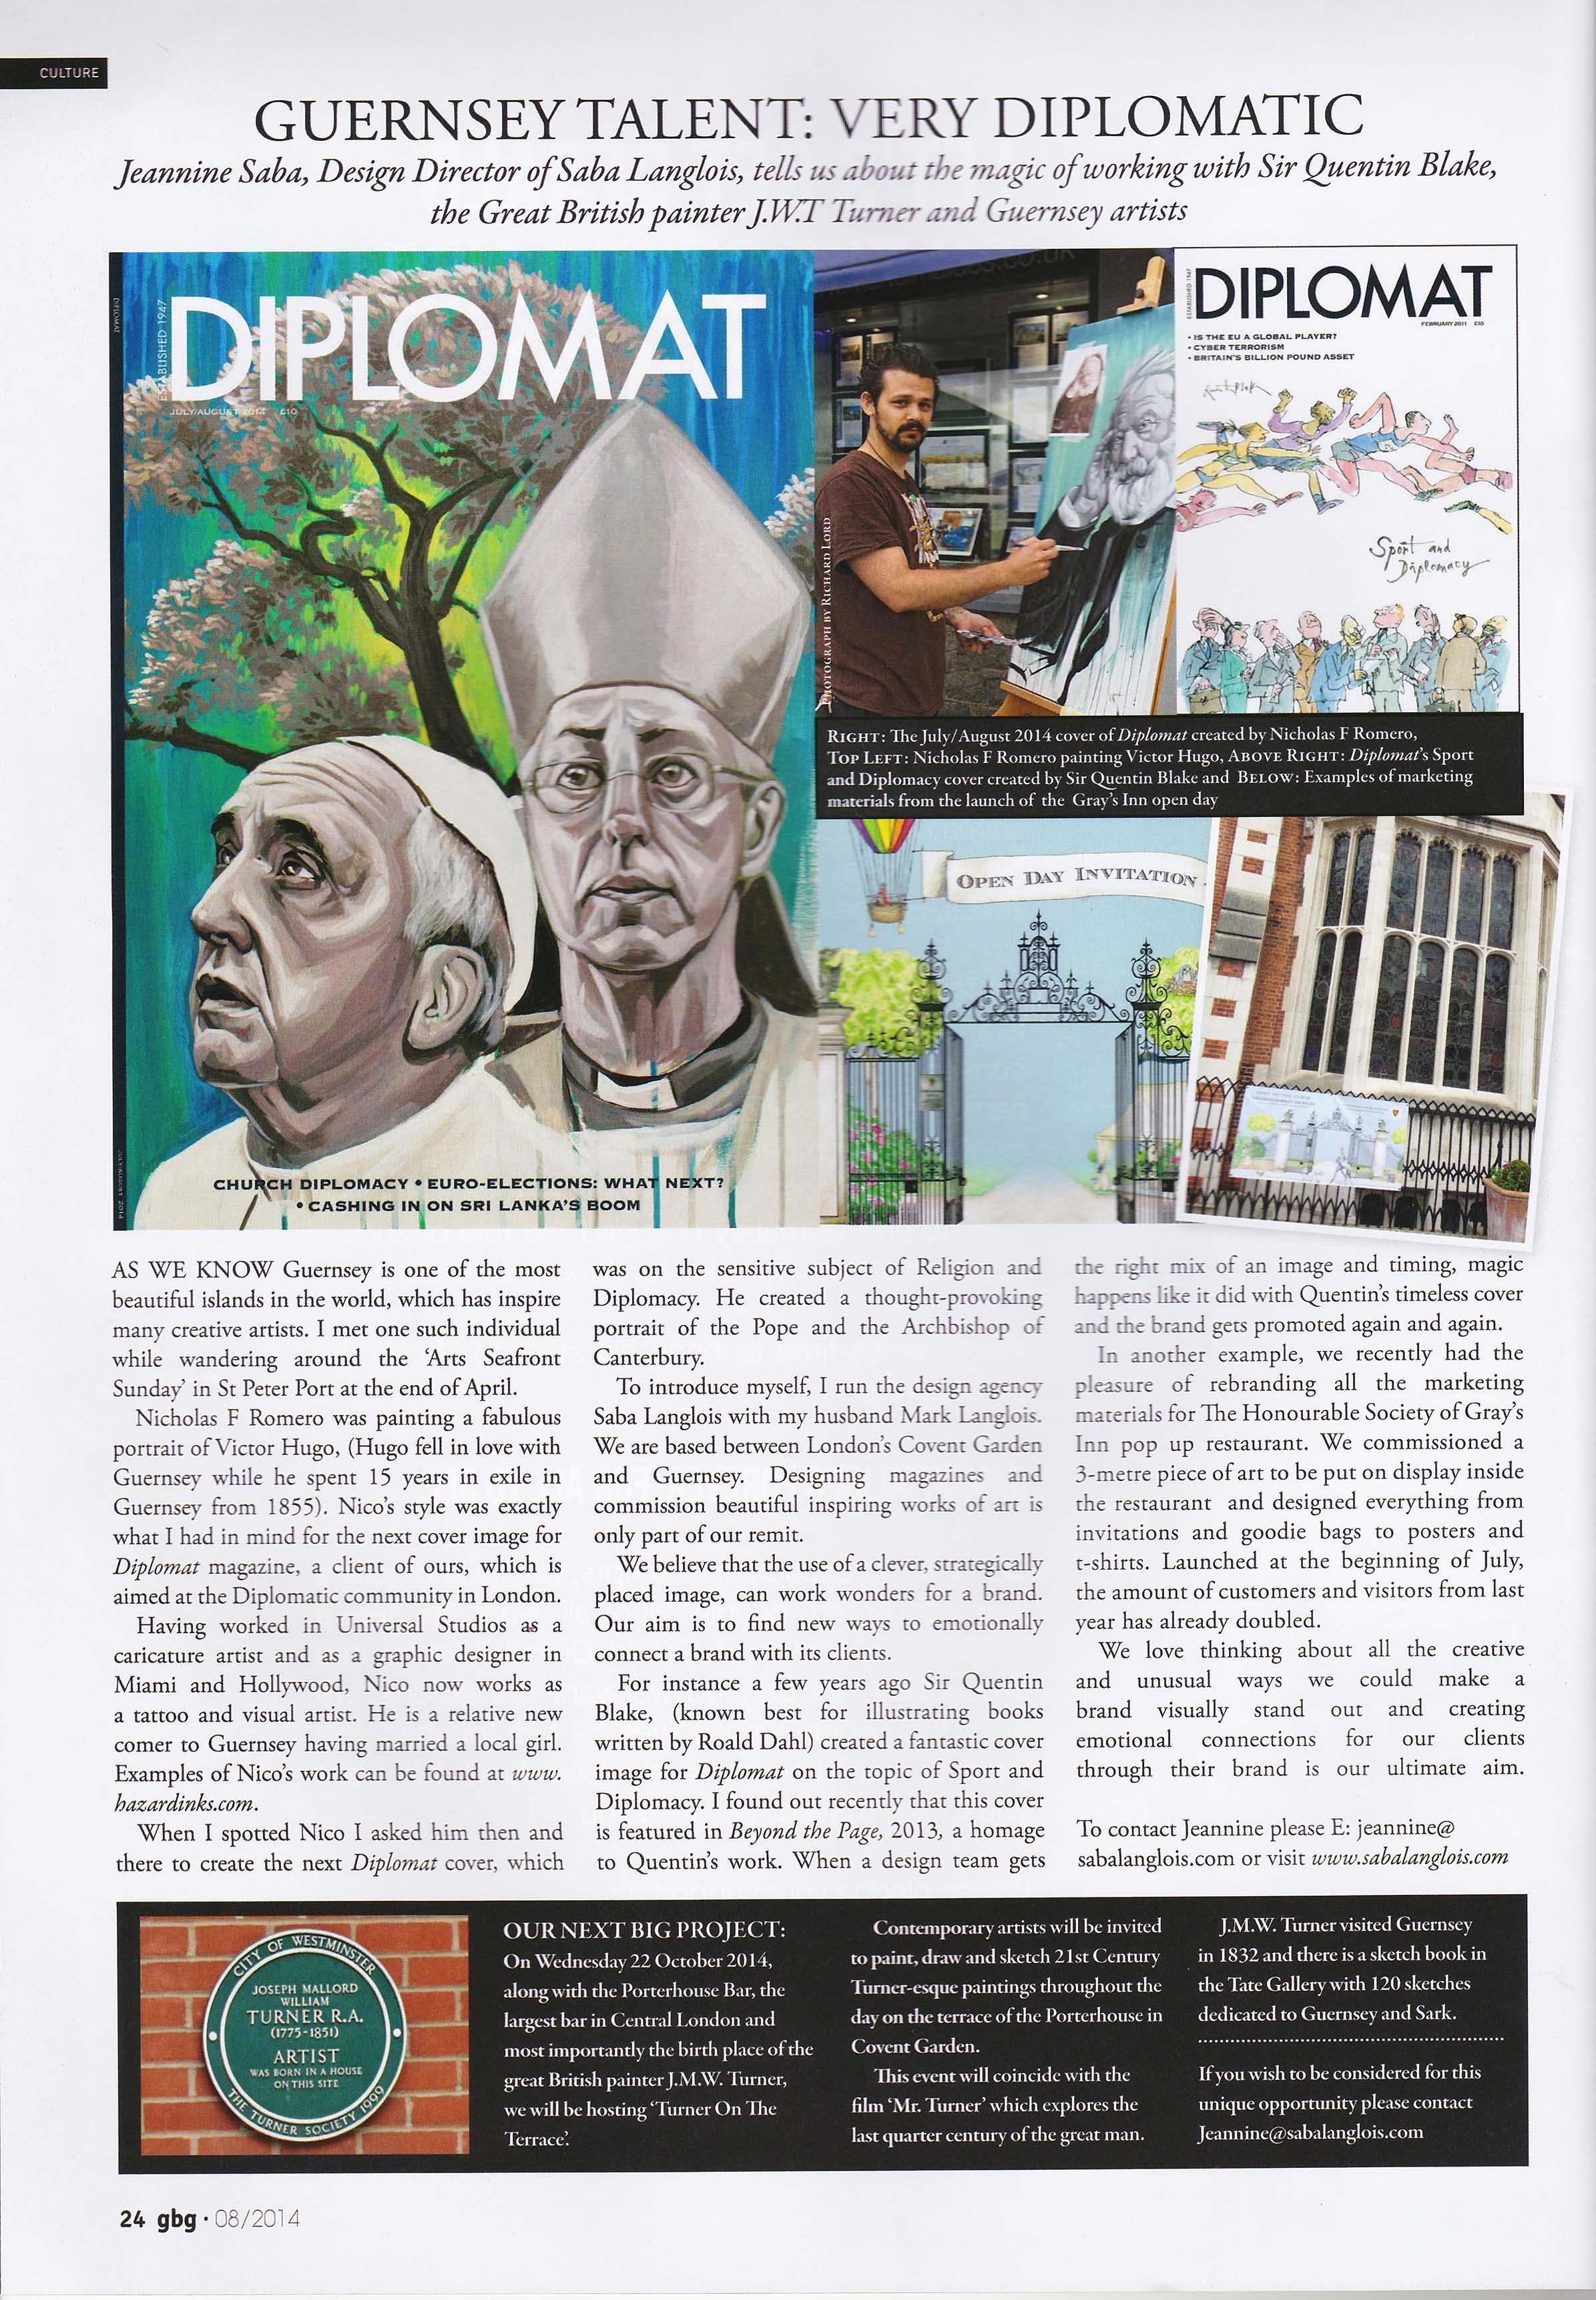 GBG magazine article on Saba Langlois